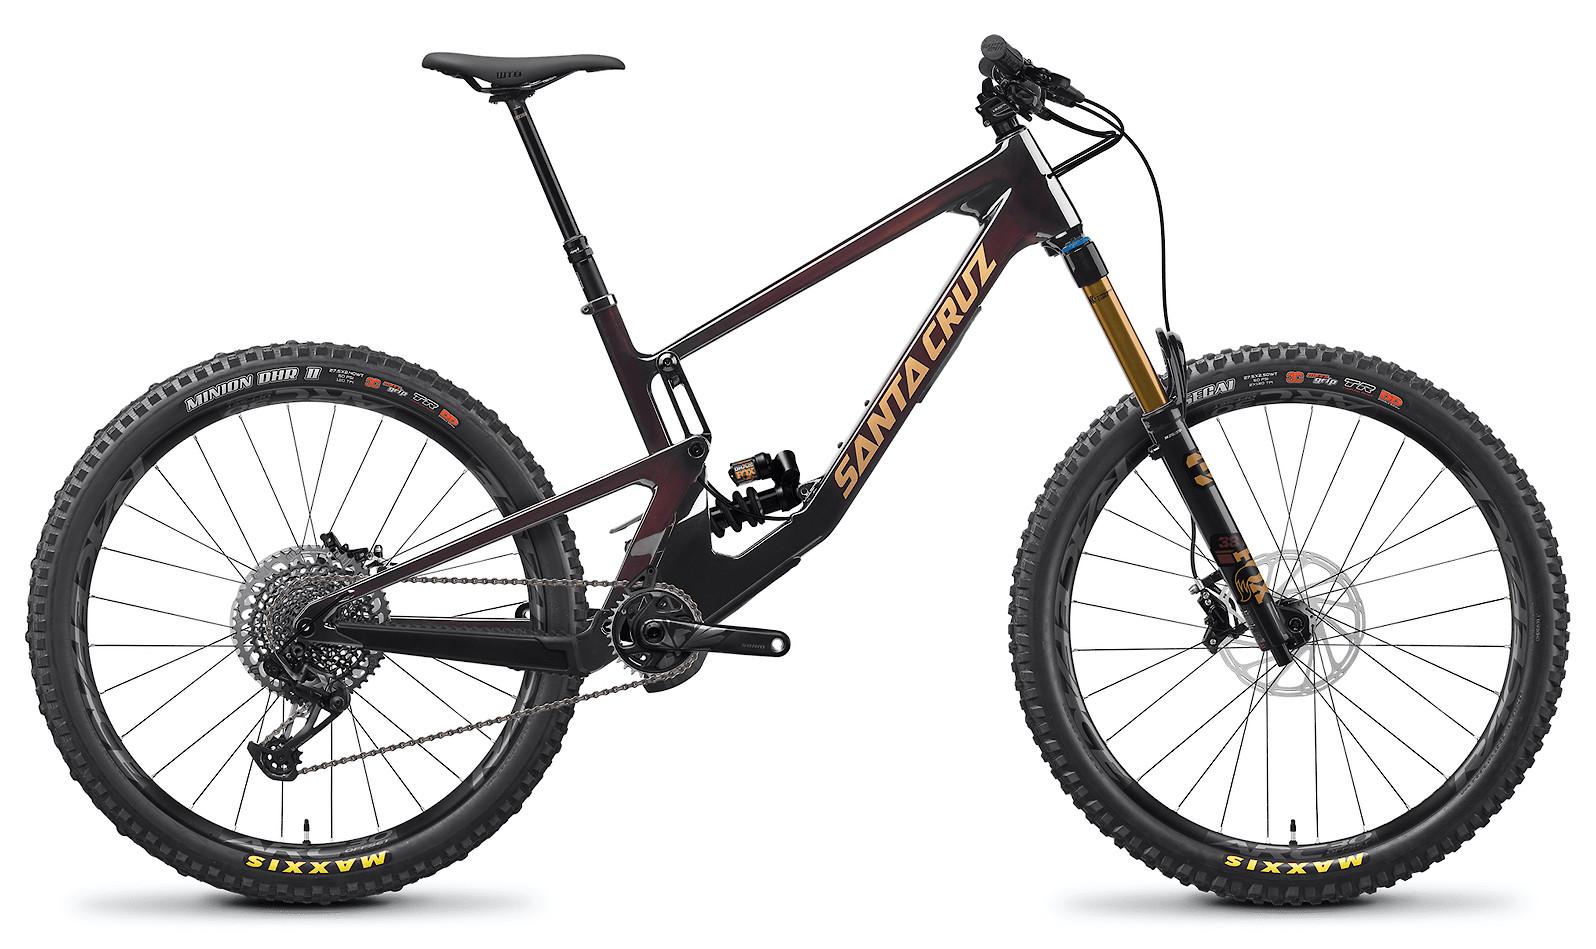 2021 Santa Cruz Nomad X01 Coil Carbon CC (Oxblood and Tan)